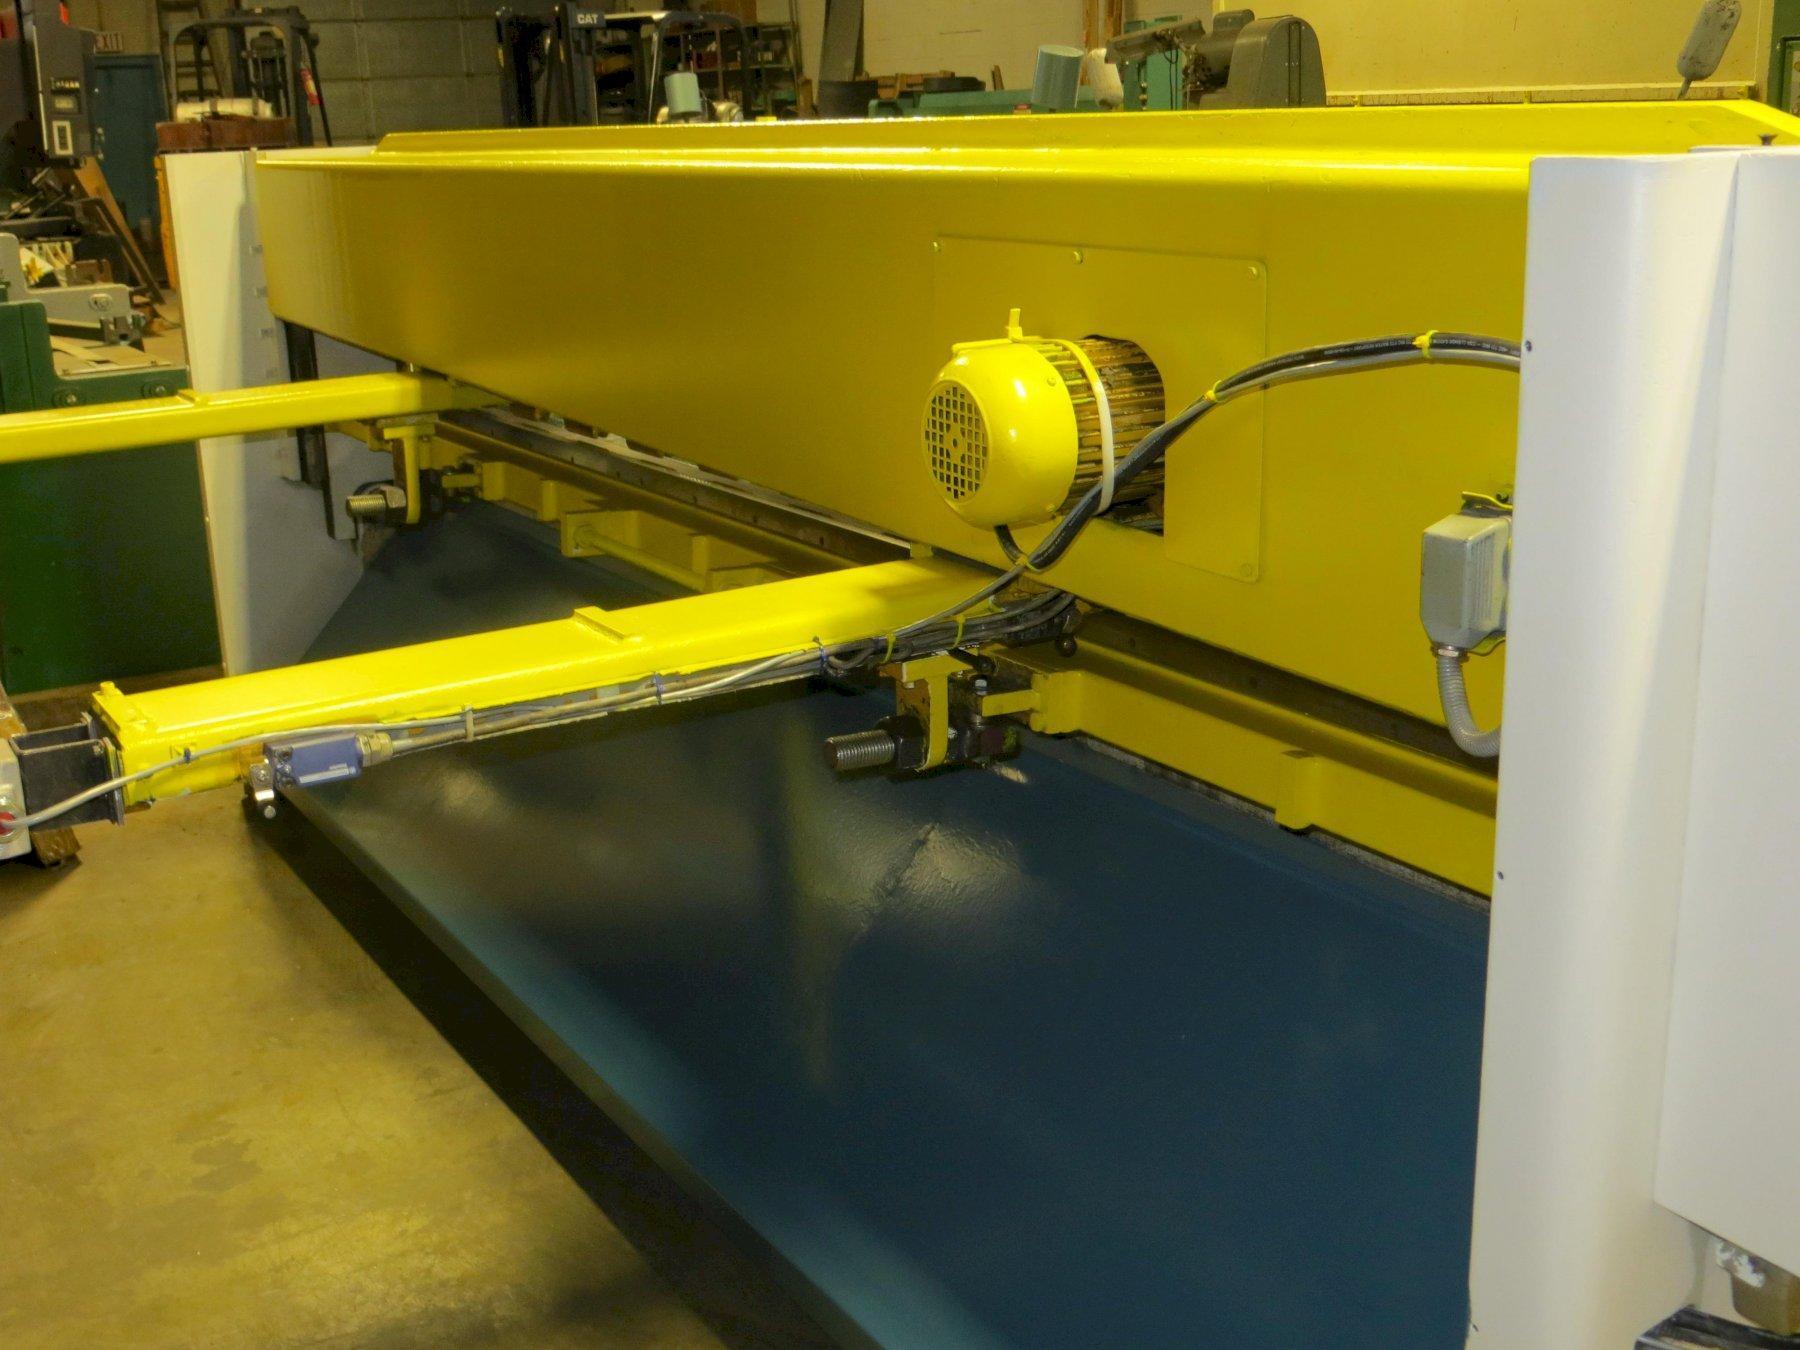 10 Ga x 10 ft Primeline (Durmazler) Mechanical Power Shear Model RGM 3004